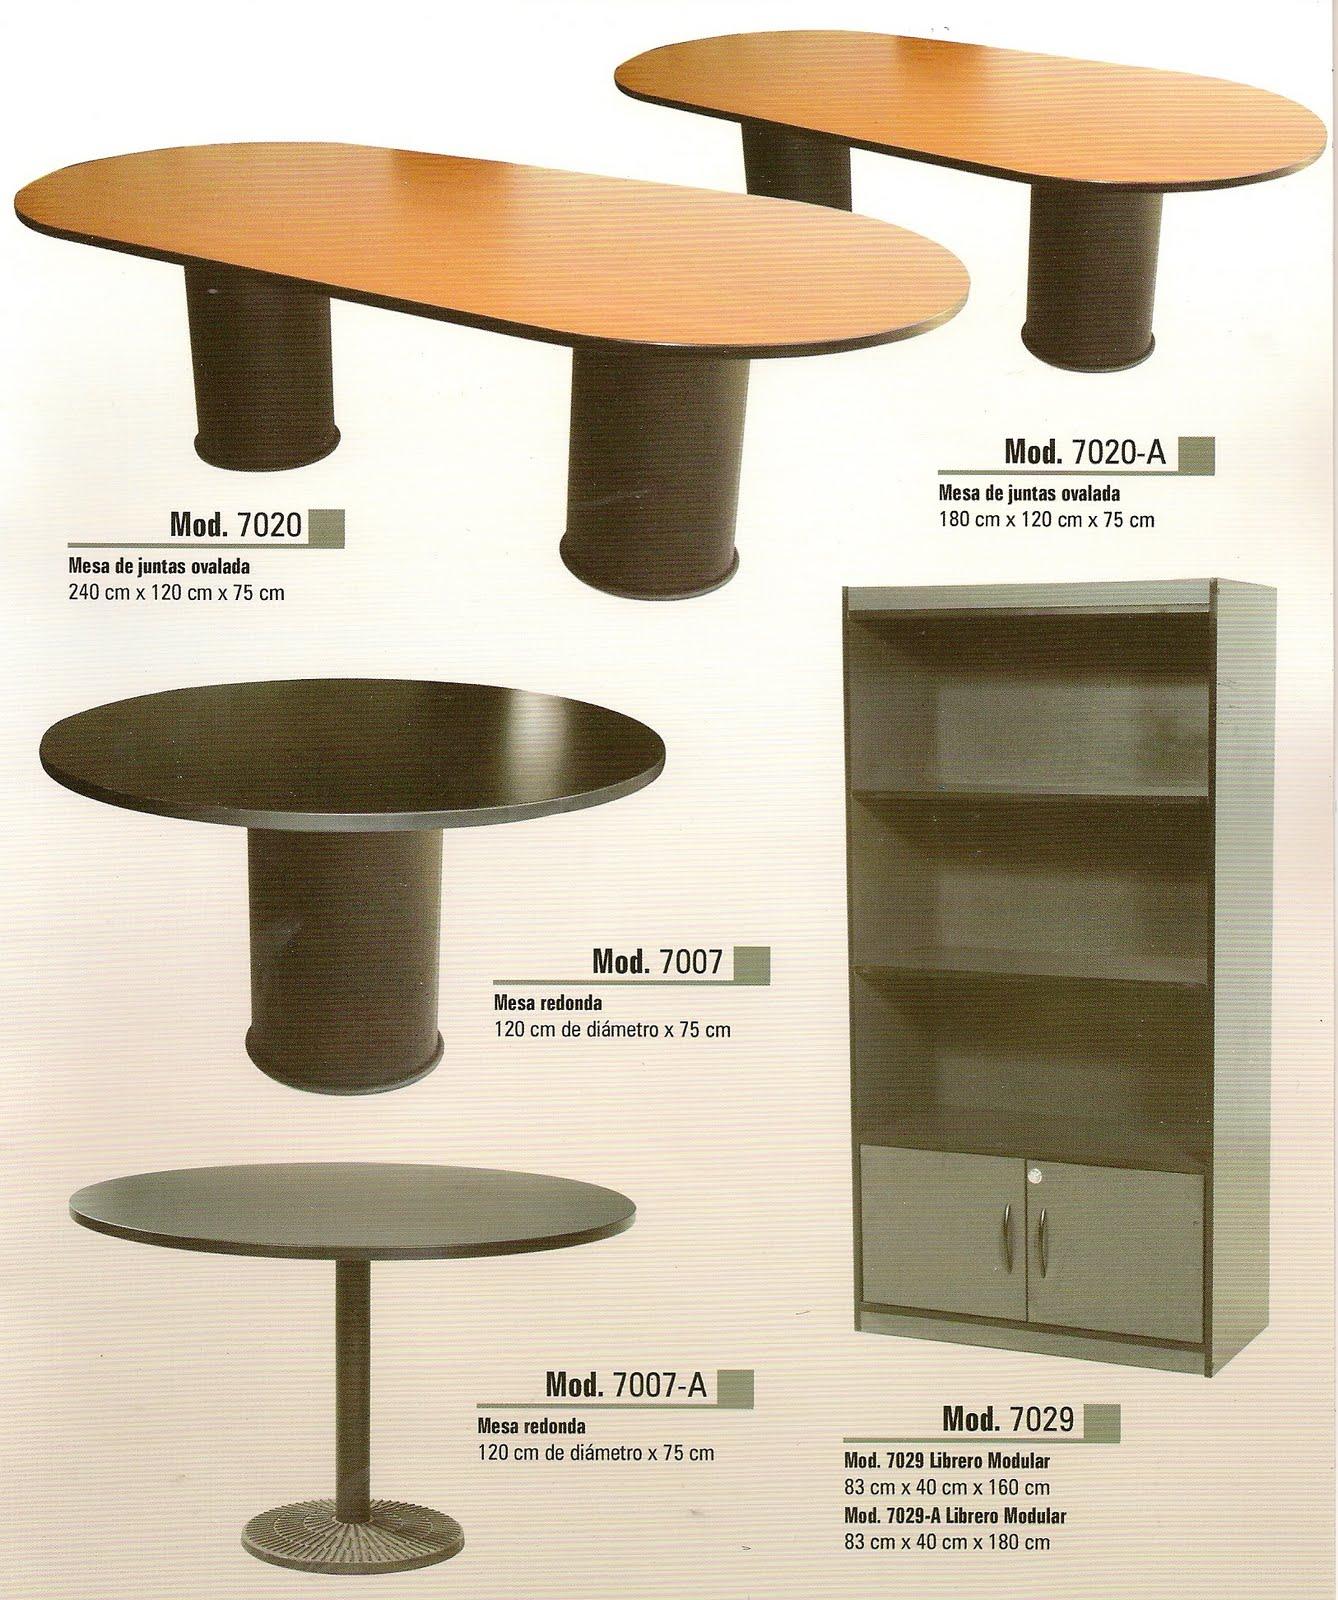 San lucas textiles muebles para oficina escritorios for Muebles de oficina k y v